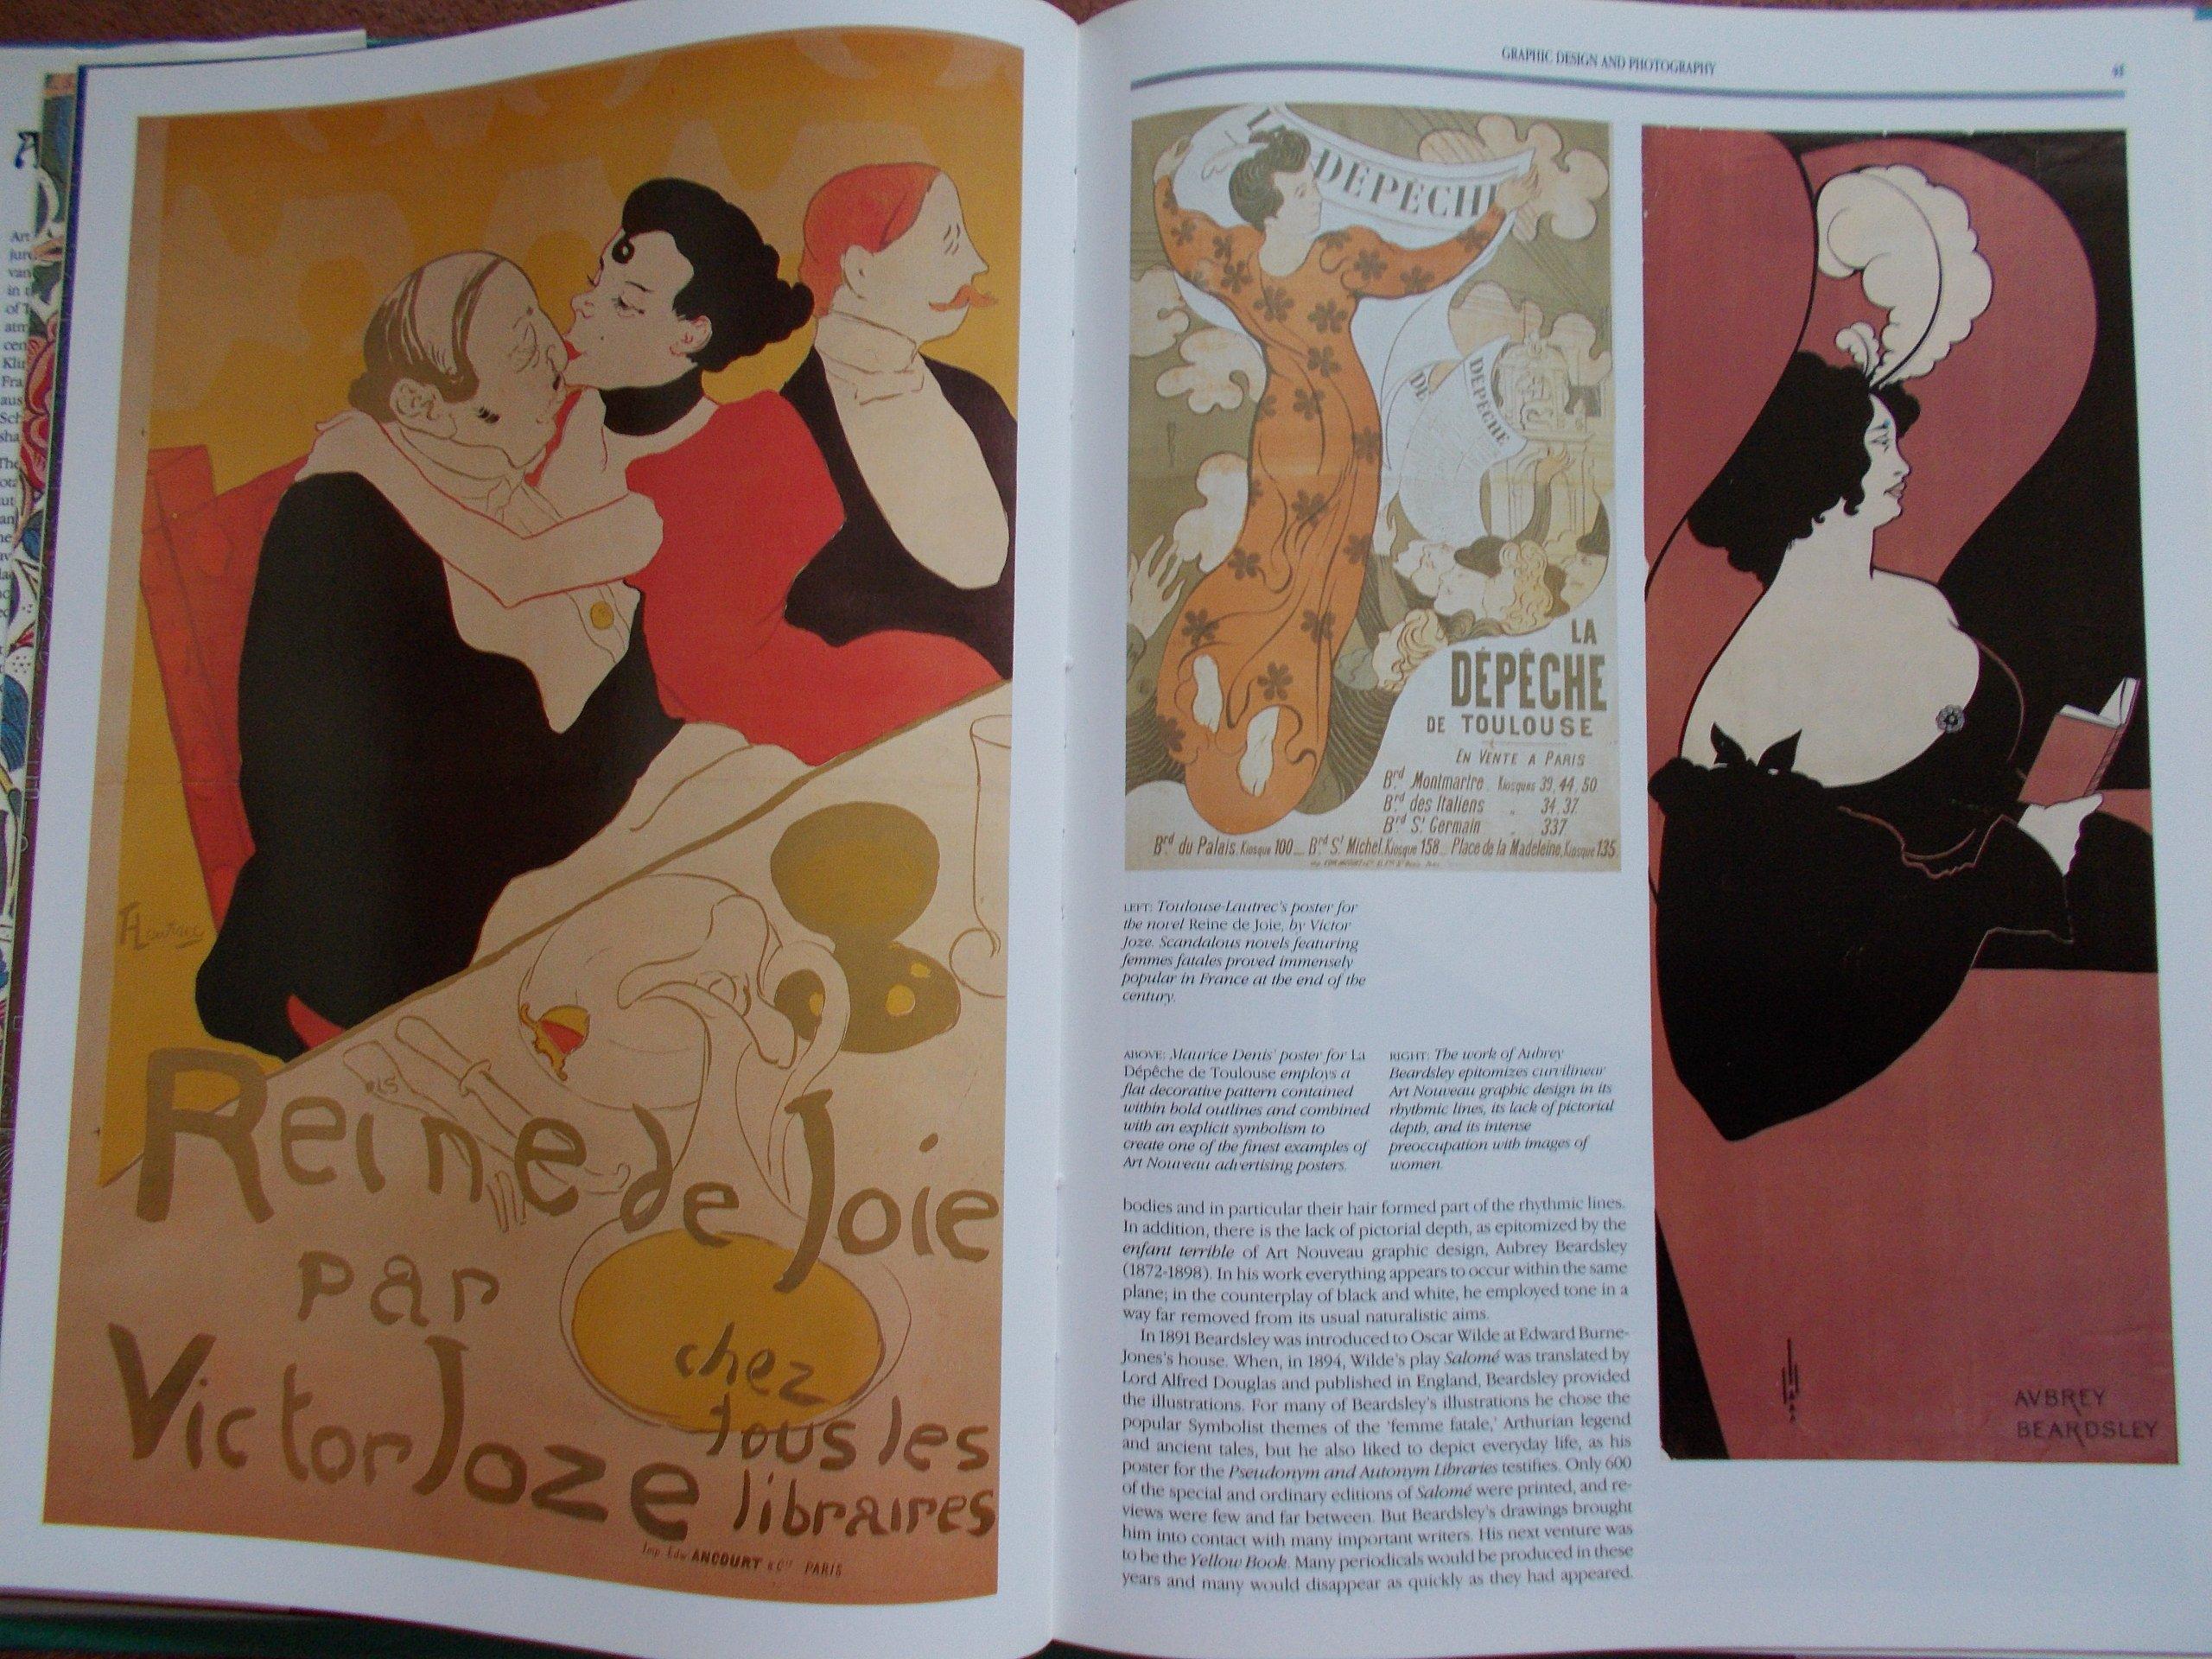 Art nouveau amazon maria costantino 9781871378870 books biocorpaavc Images